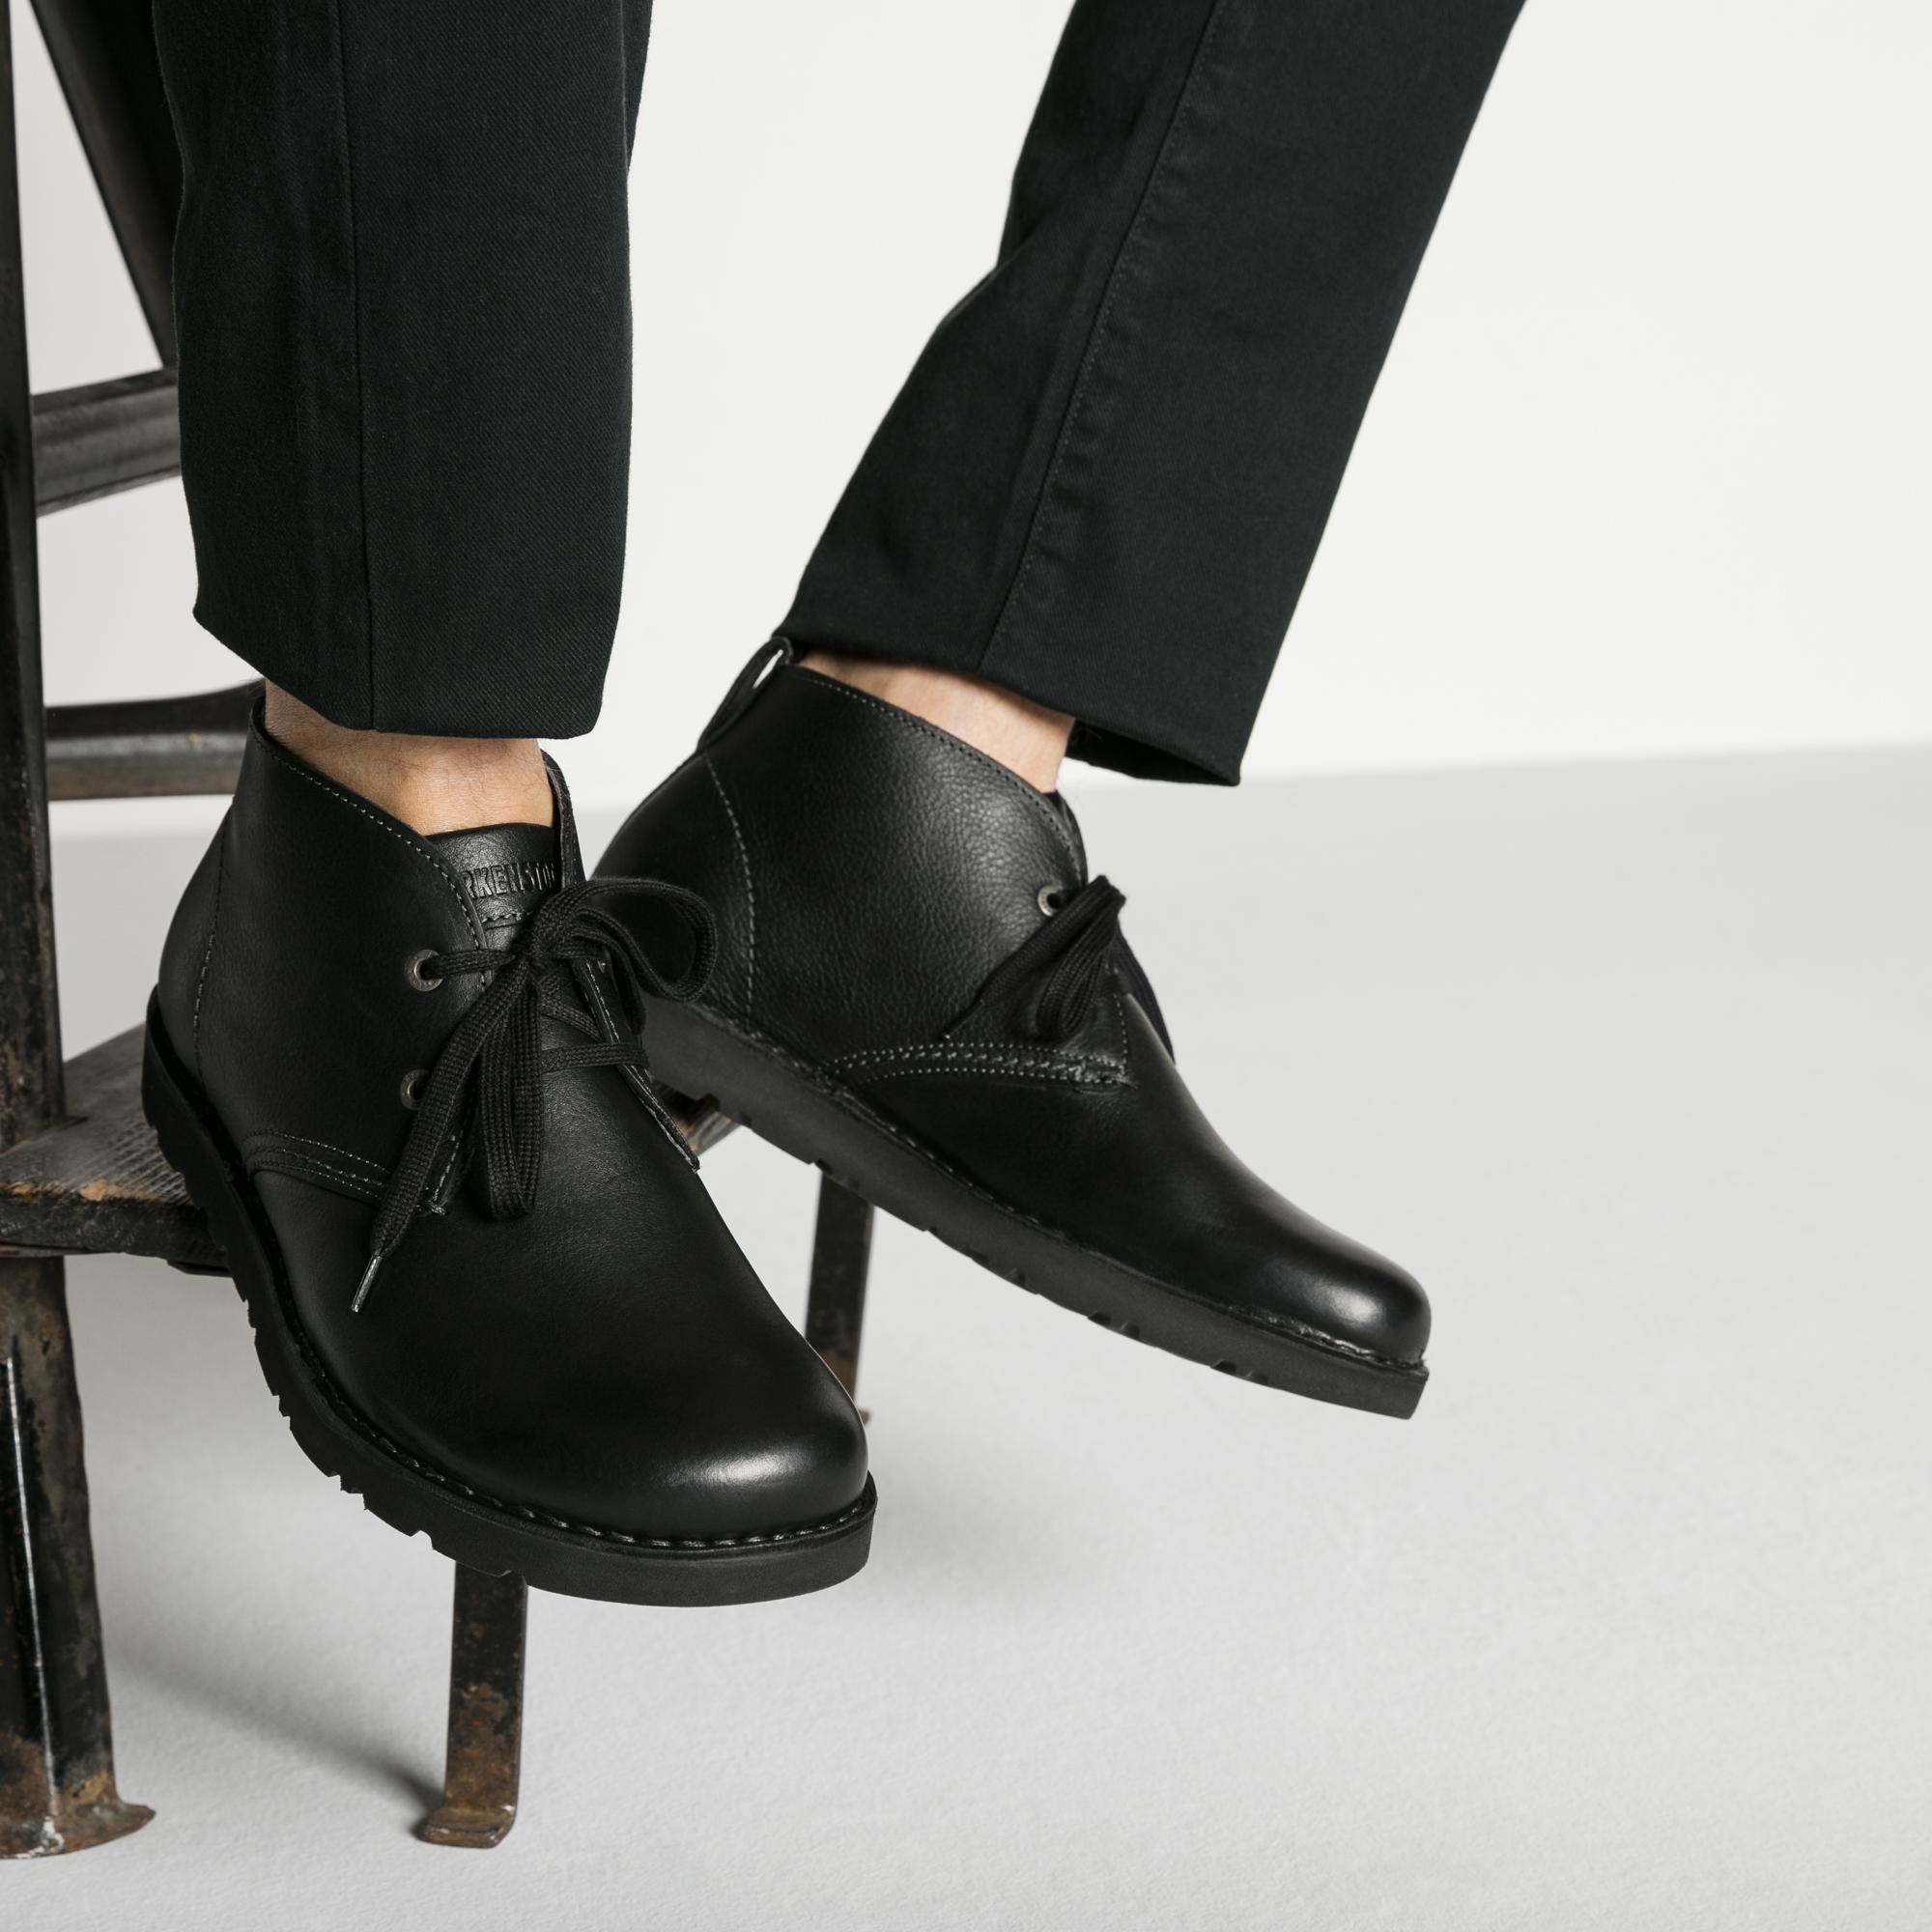 Harris Natural Leather Black